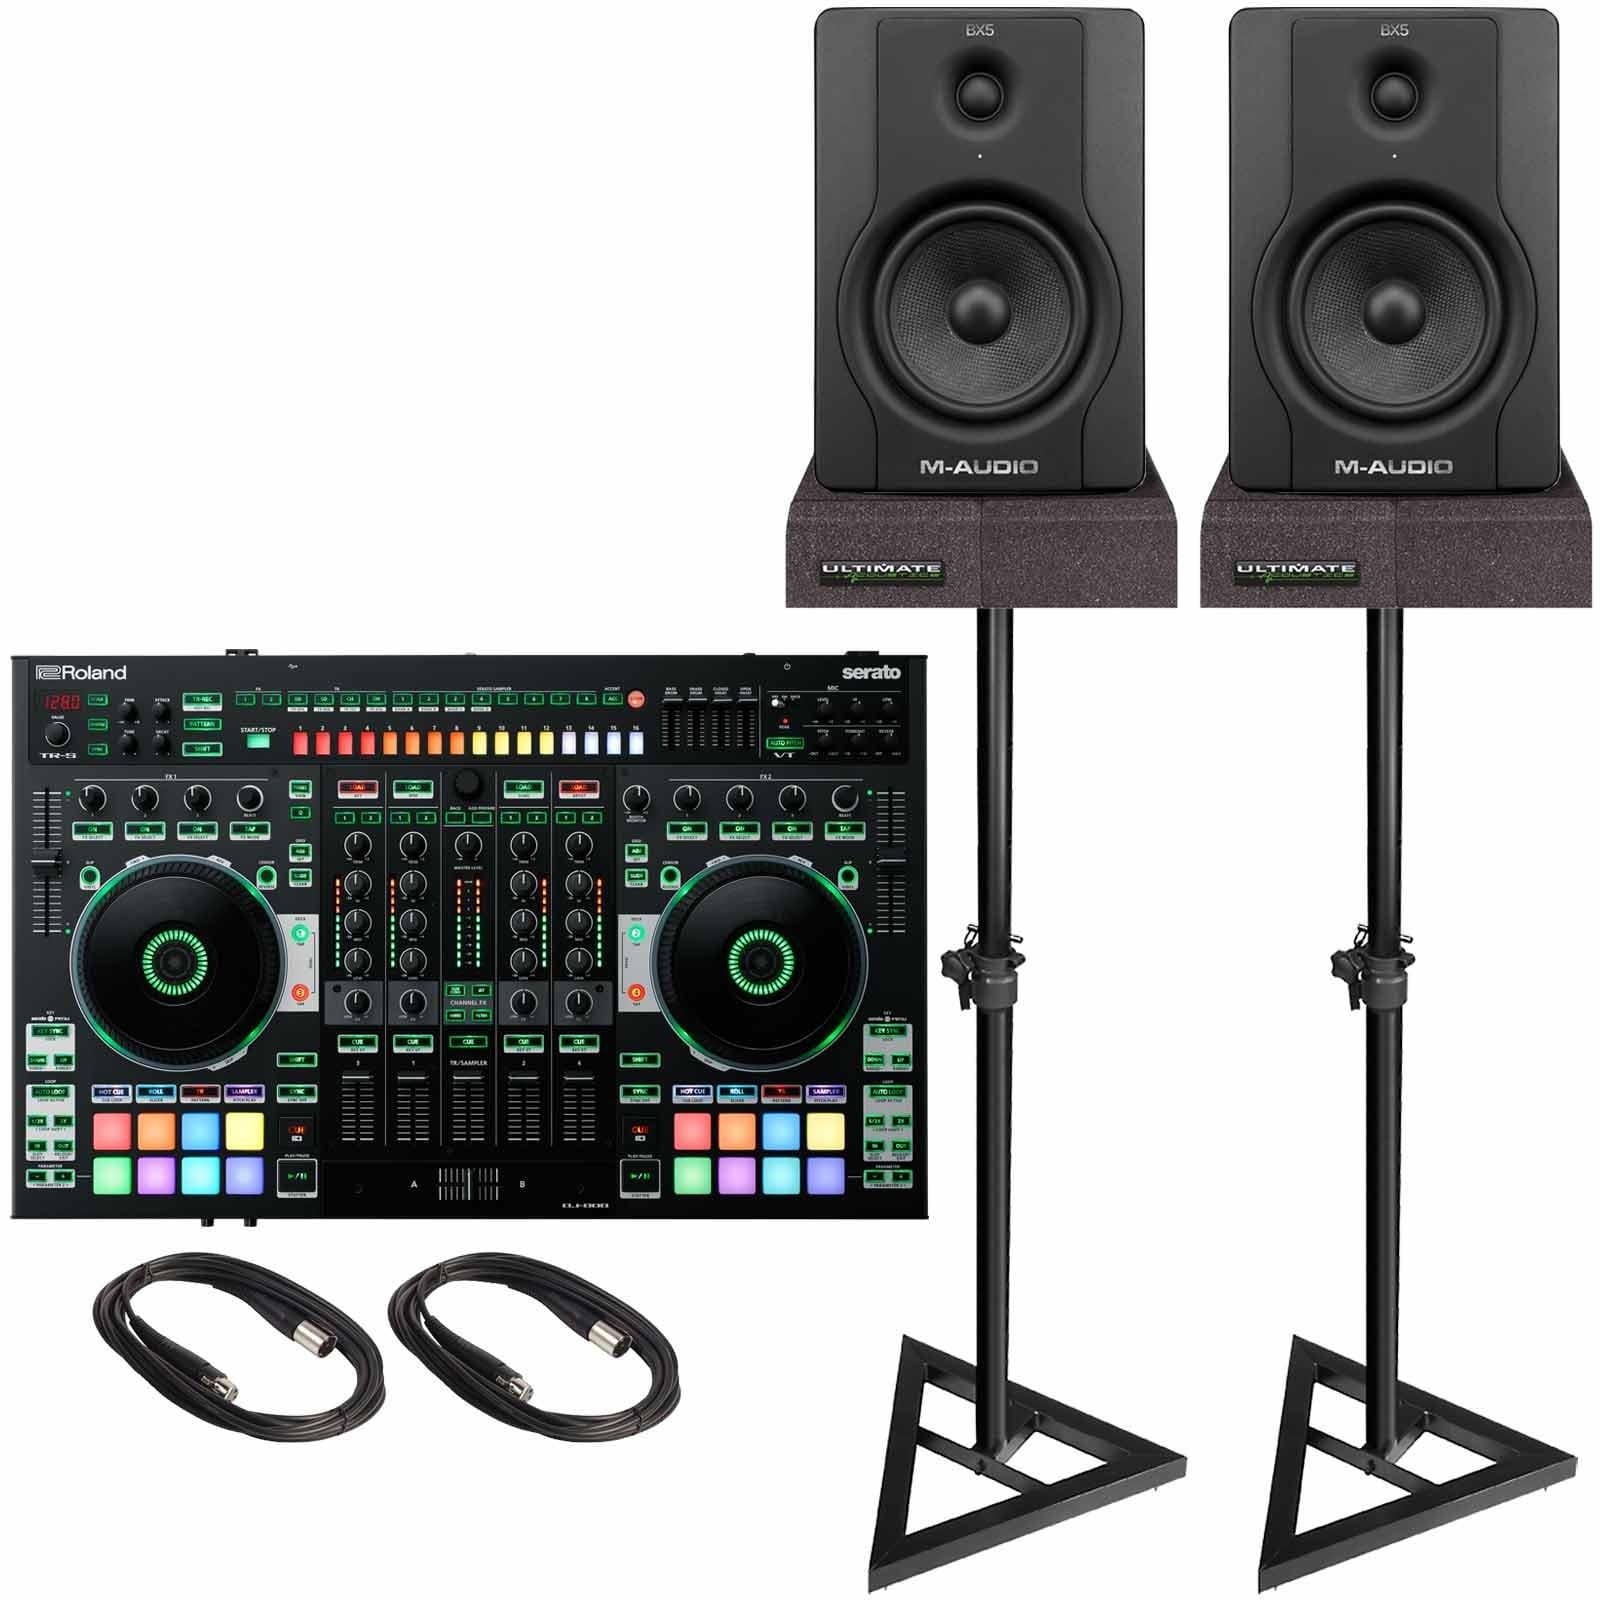 roland-dj-808-4-channel-mixer-dj-controller-with-m-audio-bx5-carbon-black-5-active-.jpg